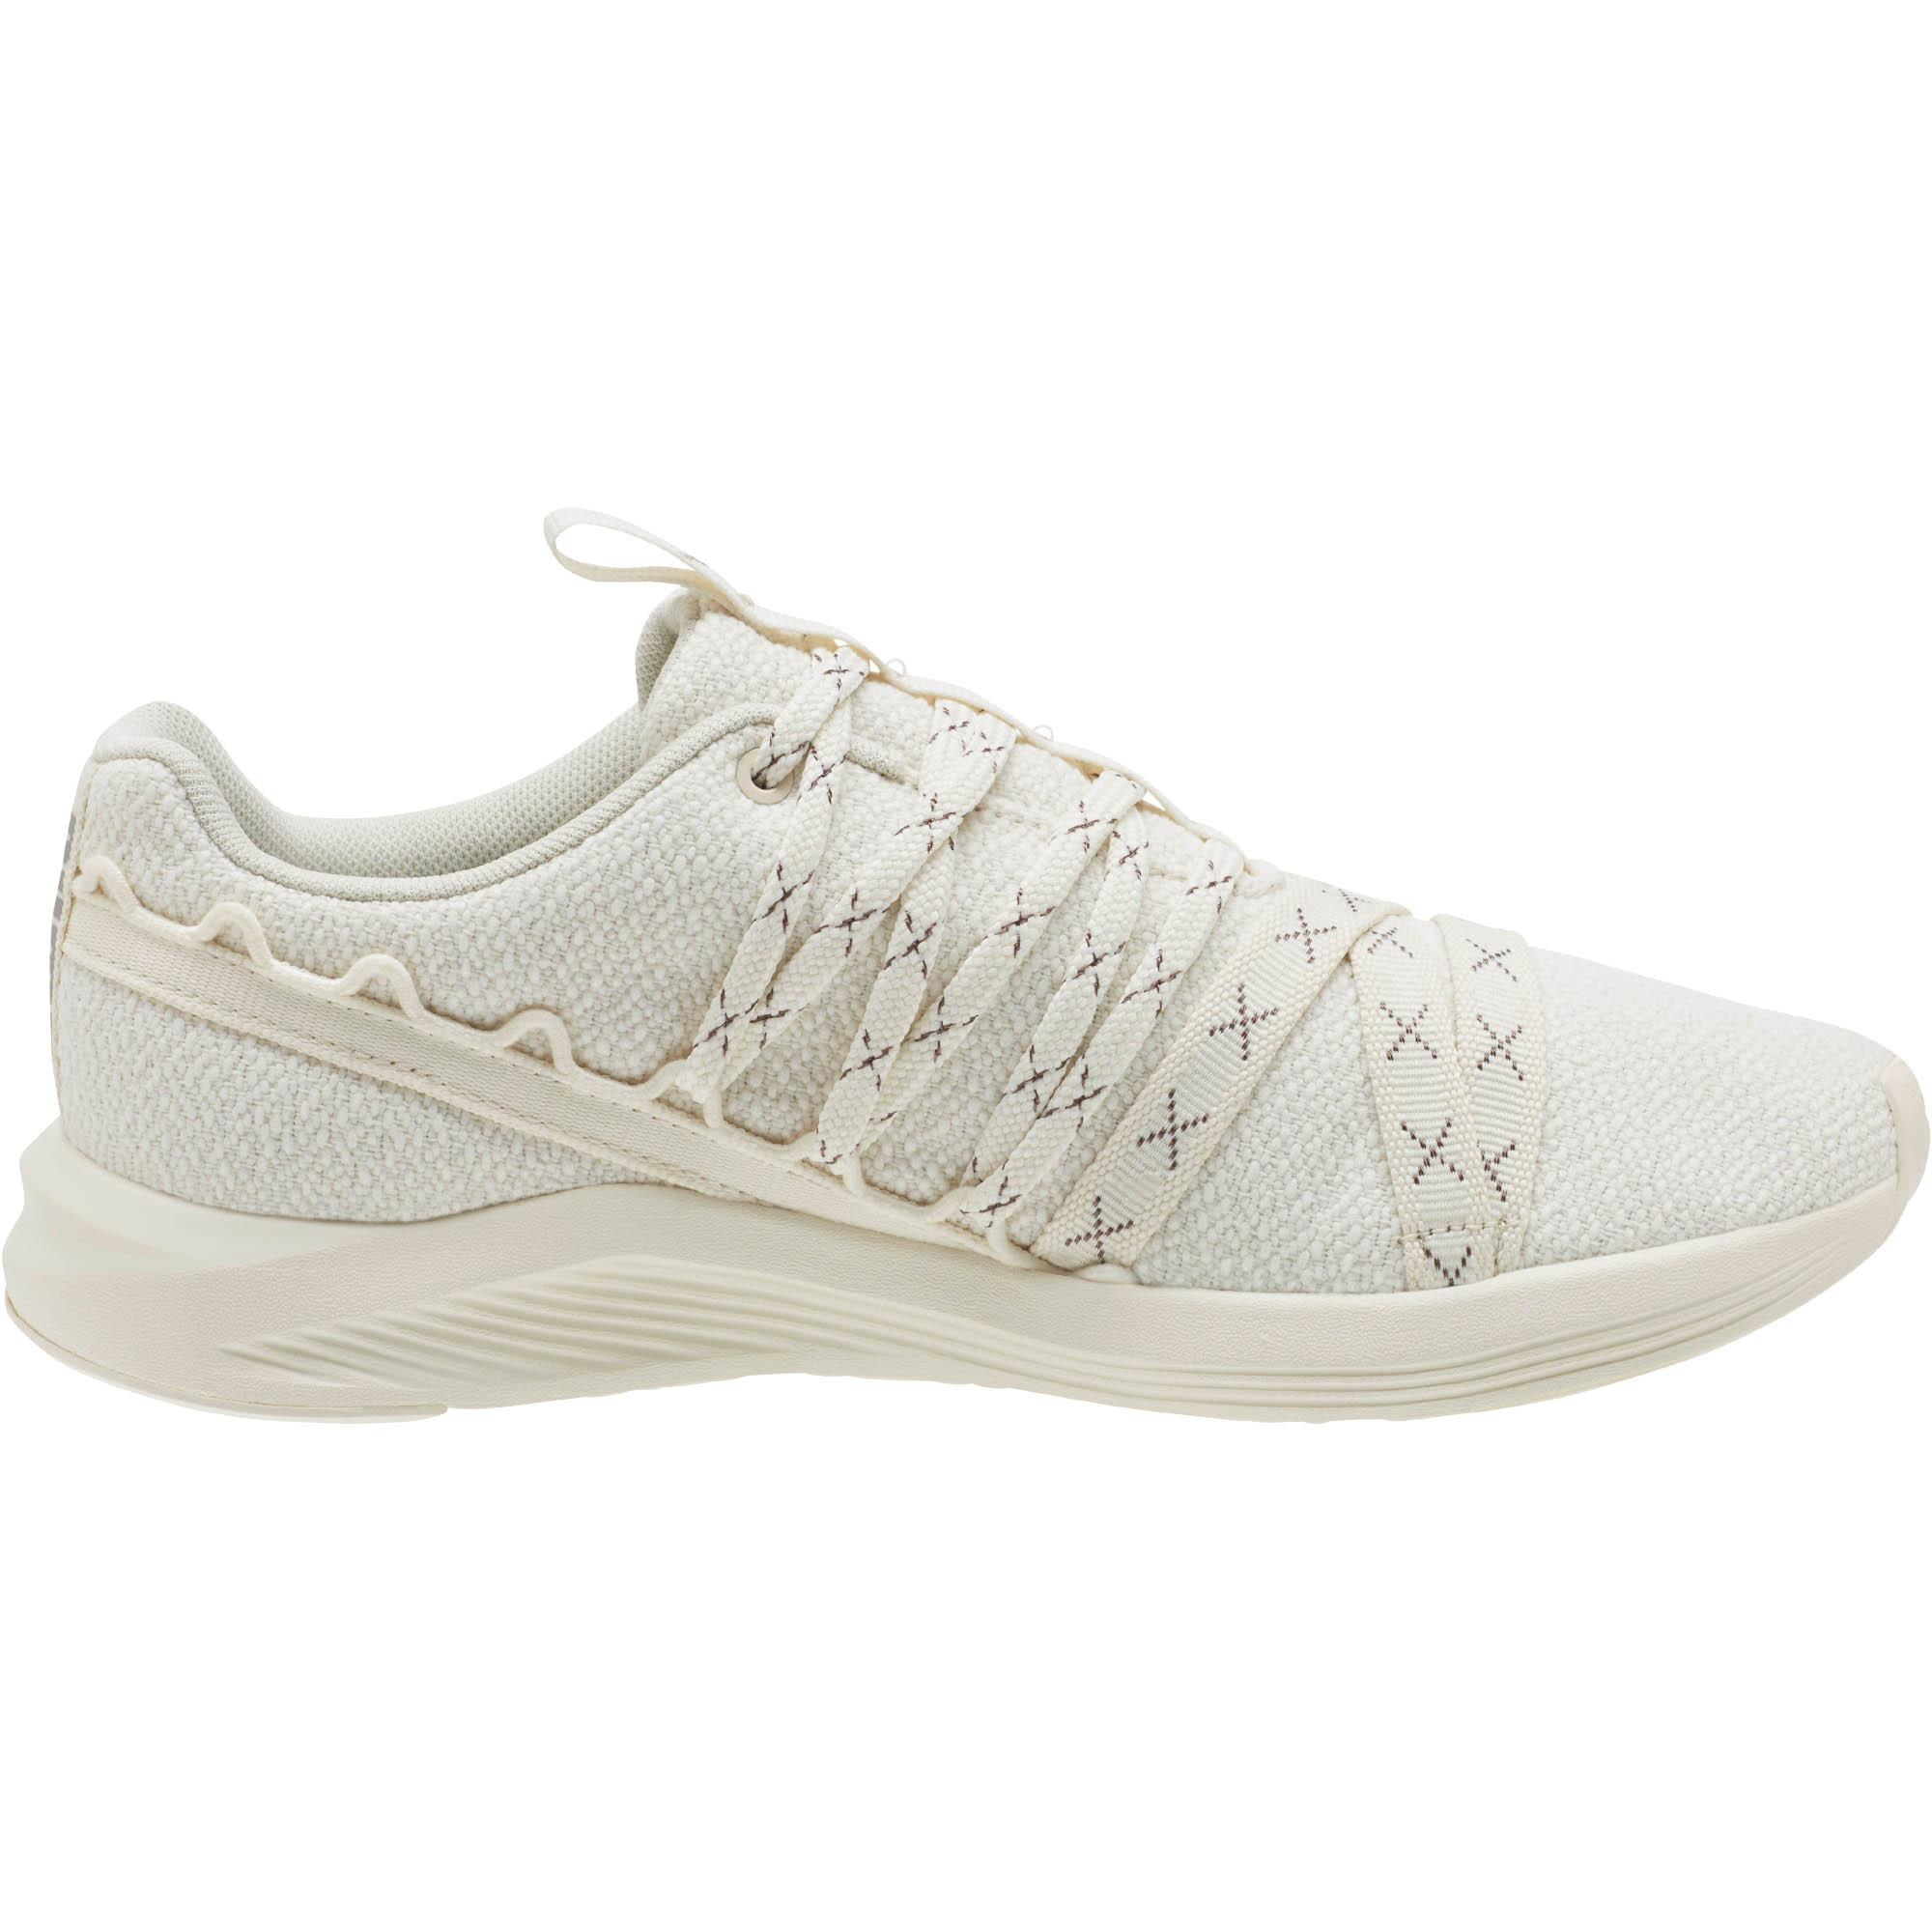 7017d296d PUMA - White Prowl Alt 2 Lx Women s Training Shoes - Lyst. View fullscreen